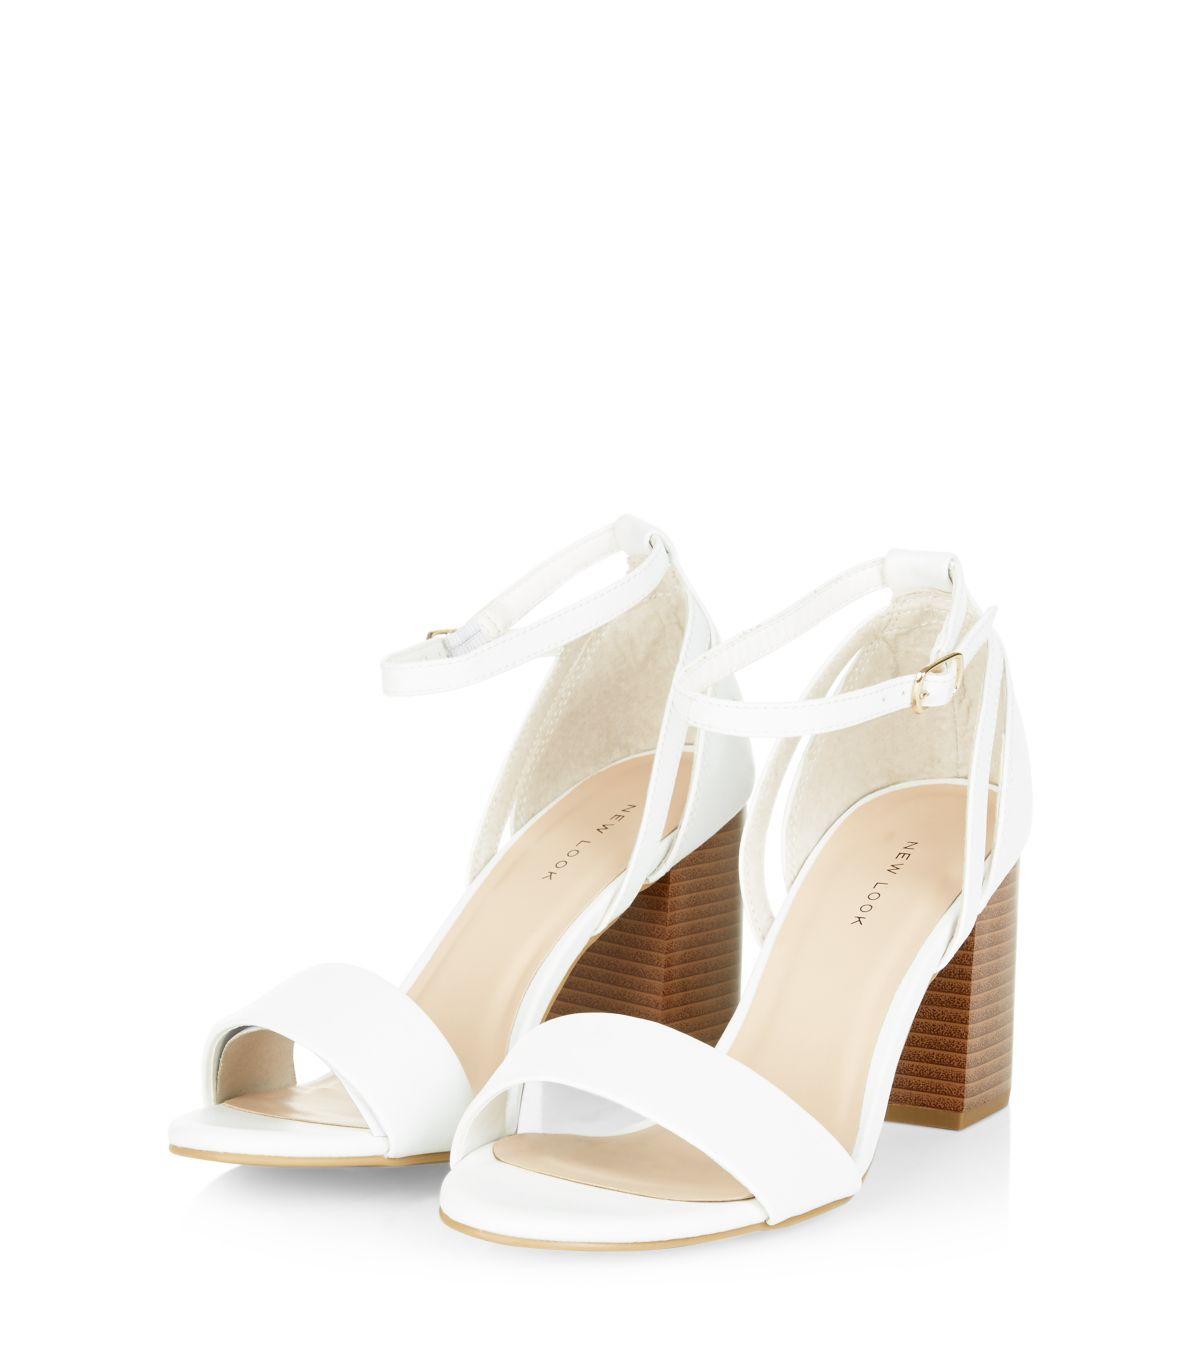 White Ankle Strap Block Heel Sandals